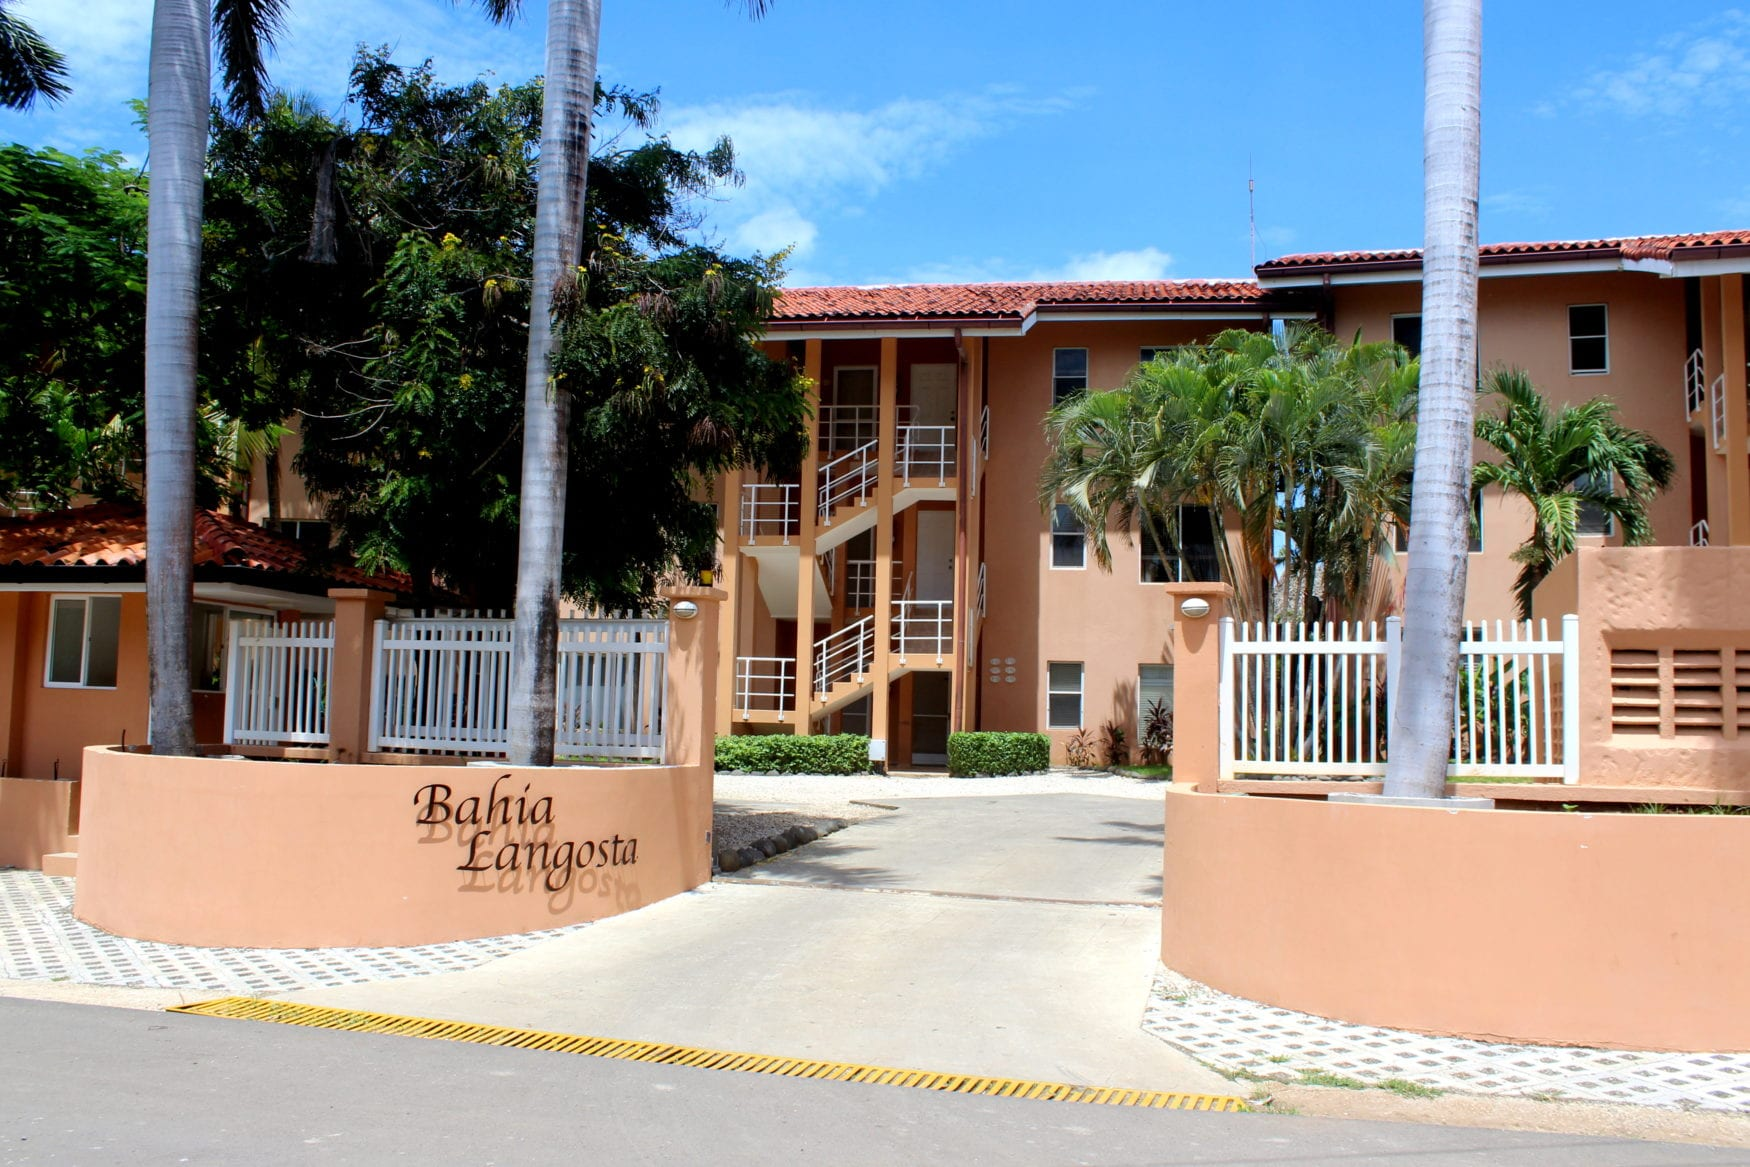 Bahia Langosta front gate IMG_2794